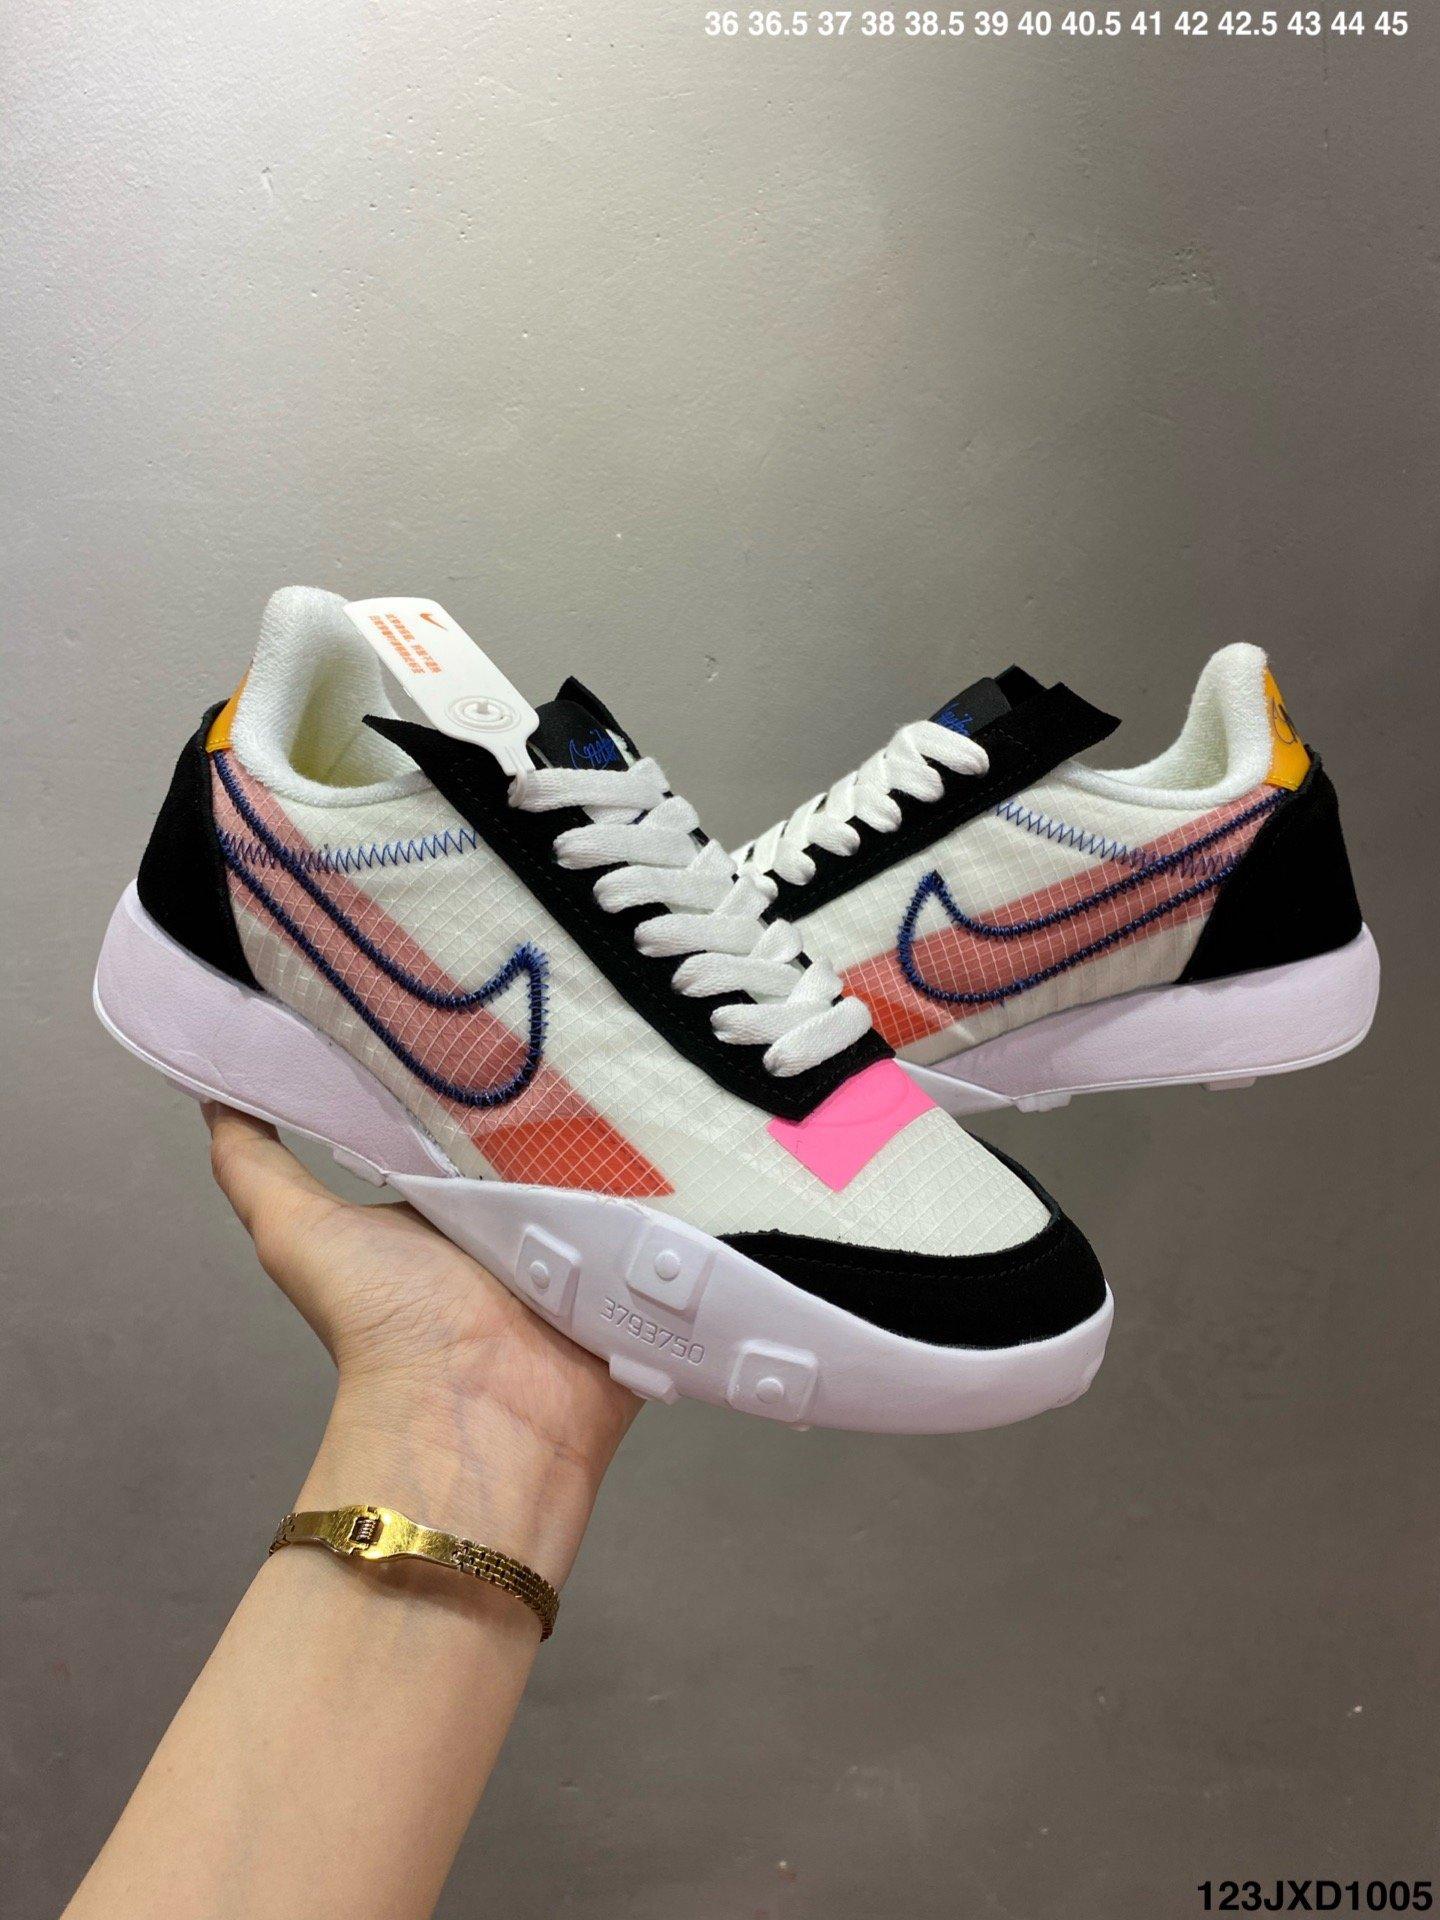 05104722507 - 运动鞋, 跑步鞋, Swoosh, Racer, Nike Waffle Racer 2X